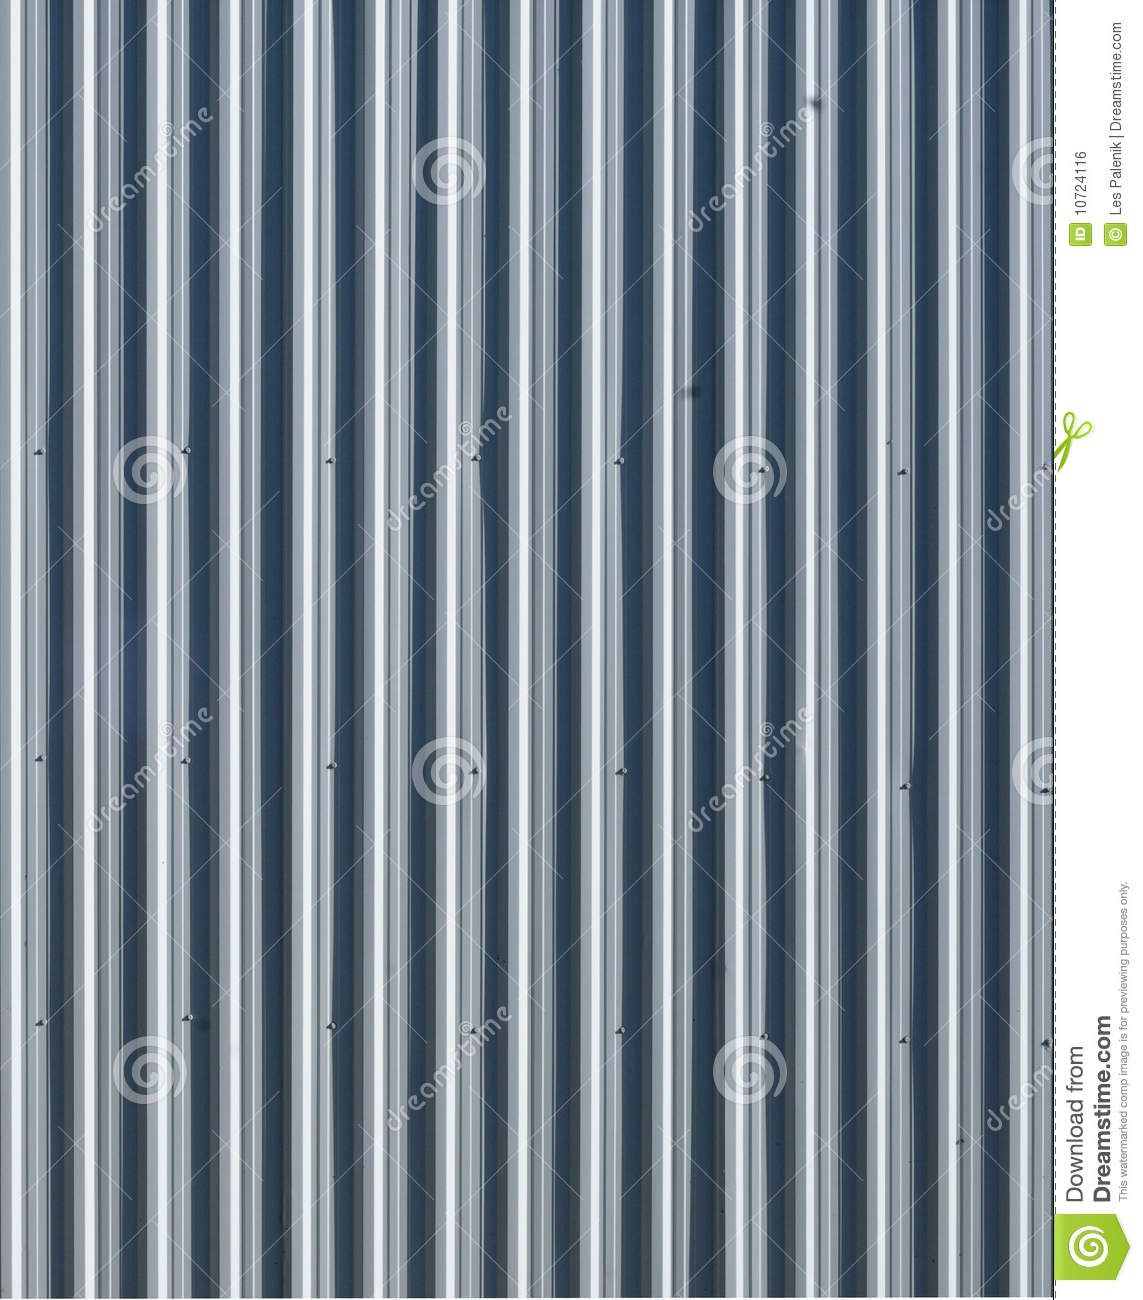 Corrugated Roof Panels Profile View Similar Stock Images Of Aluminum Wall Siding Corrugated Metal Aluminum Wall Corrugated Metal Tin Panels Wall